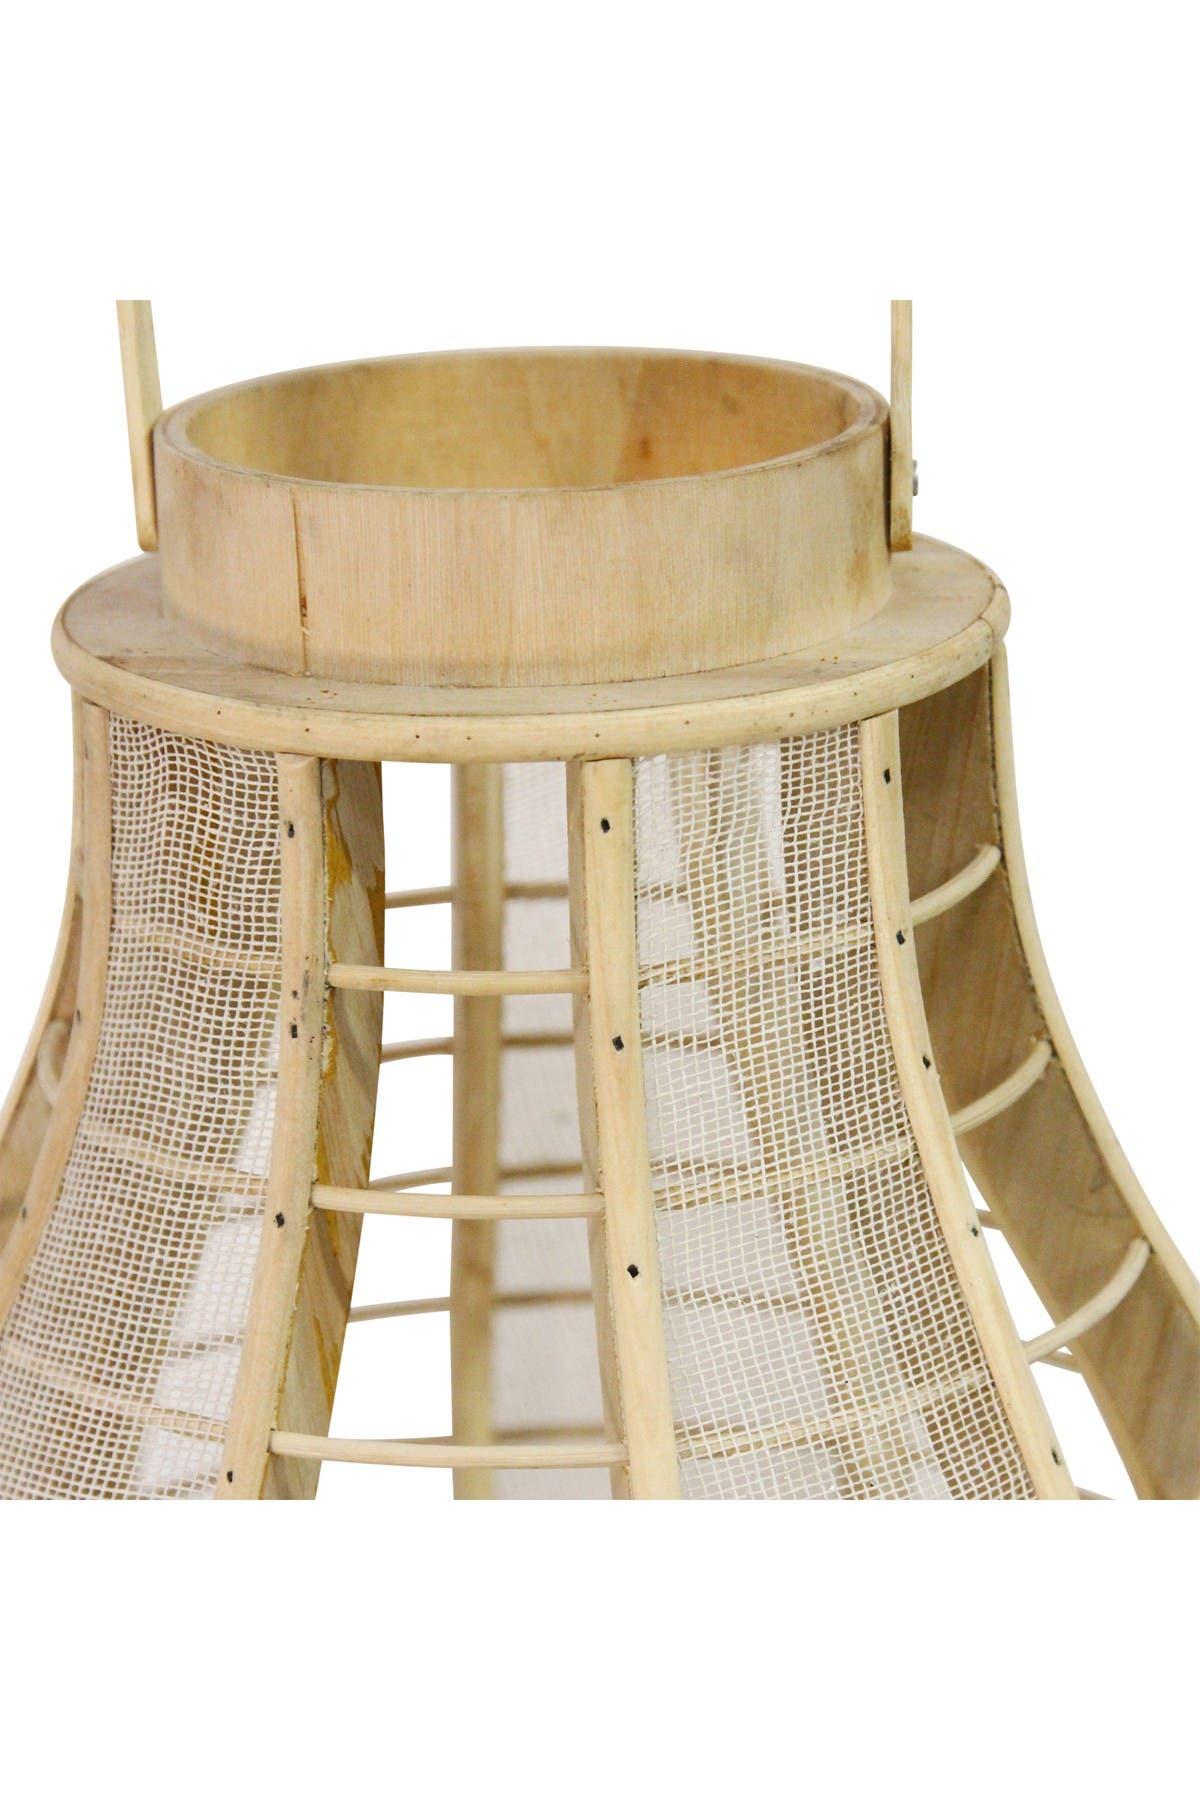 Image of Stratton Home Light Brown/White Wood & Burlap Mesh Lantern